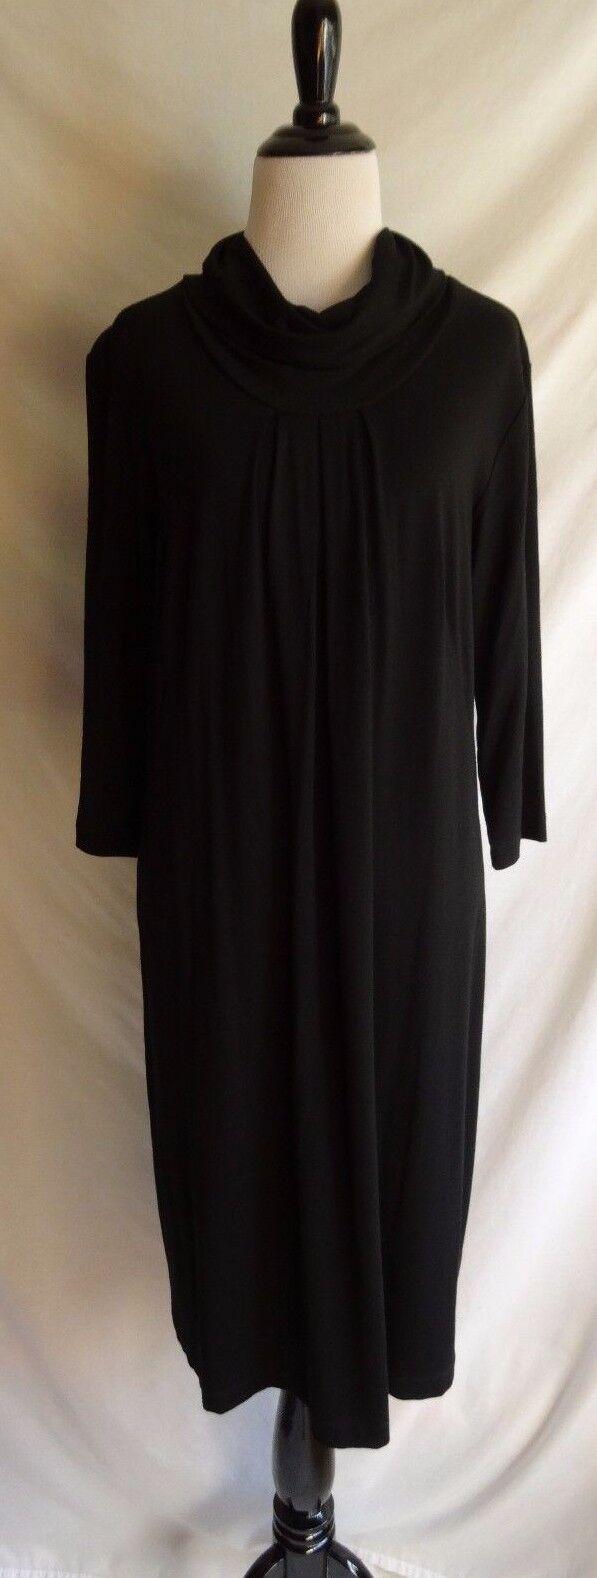 J. Jill Stretch Medium Solid schwarz Cowl Neck Turtleneck Jersey Knit Shift Dress